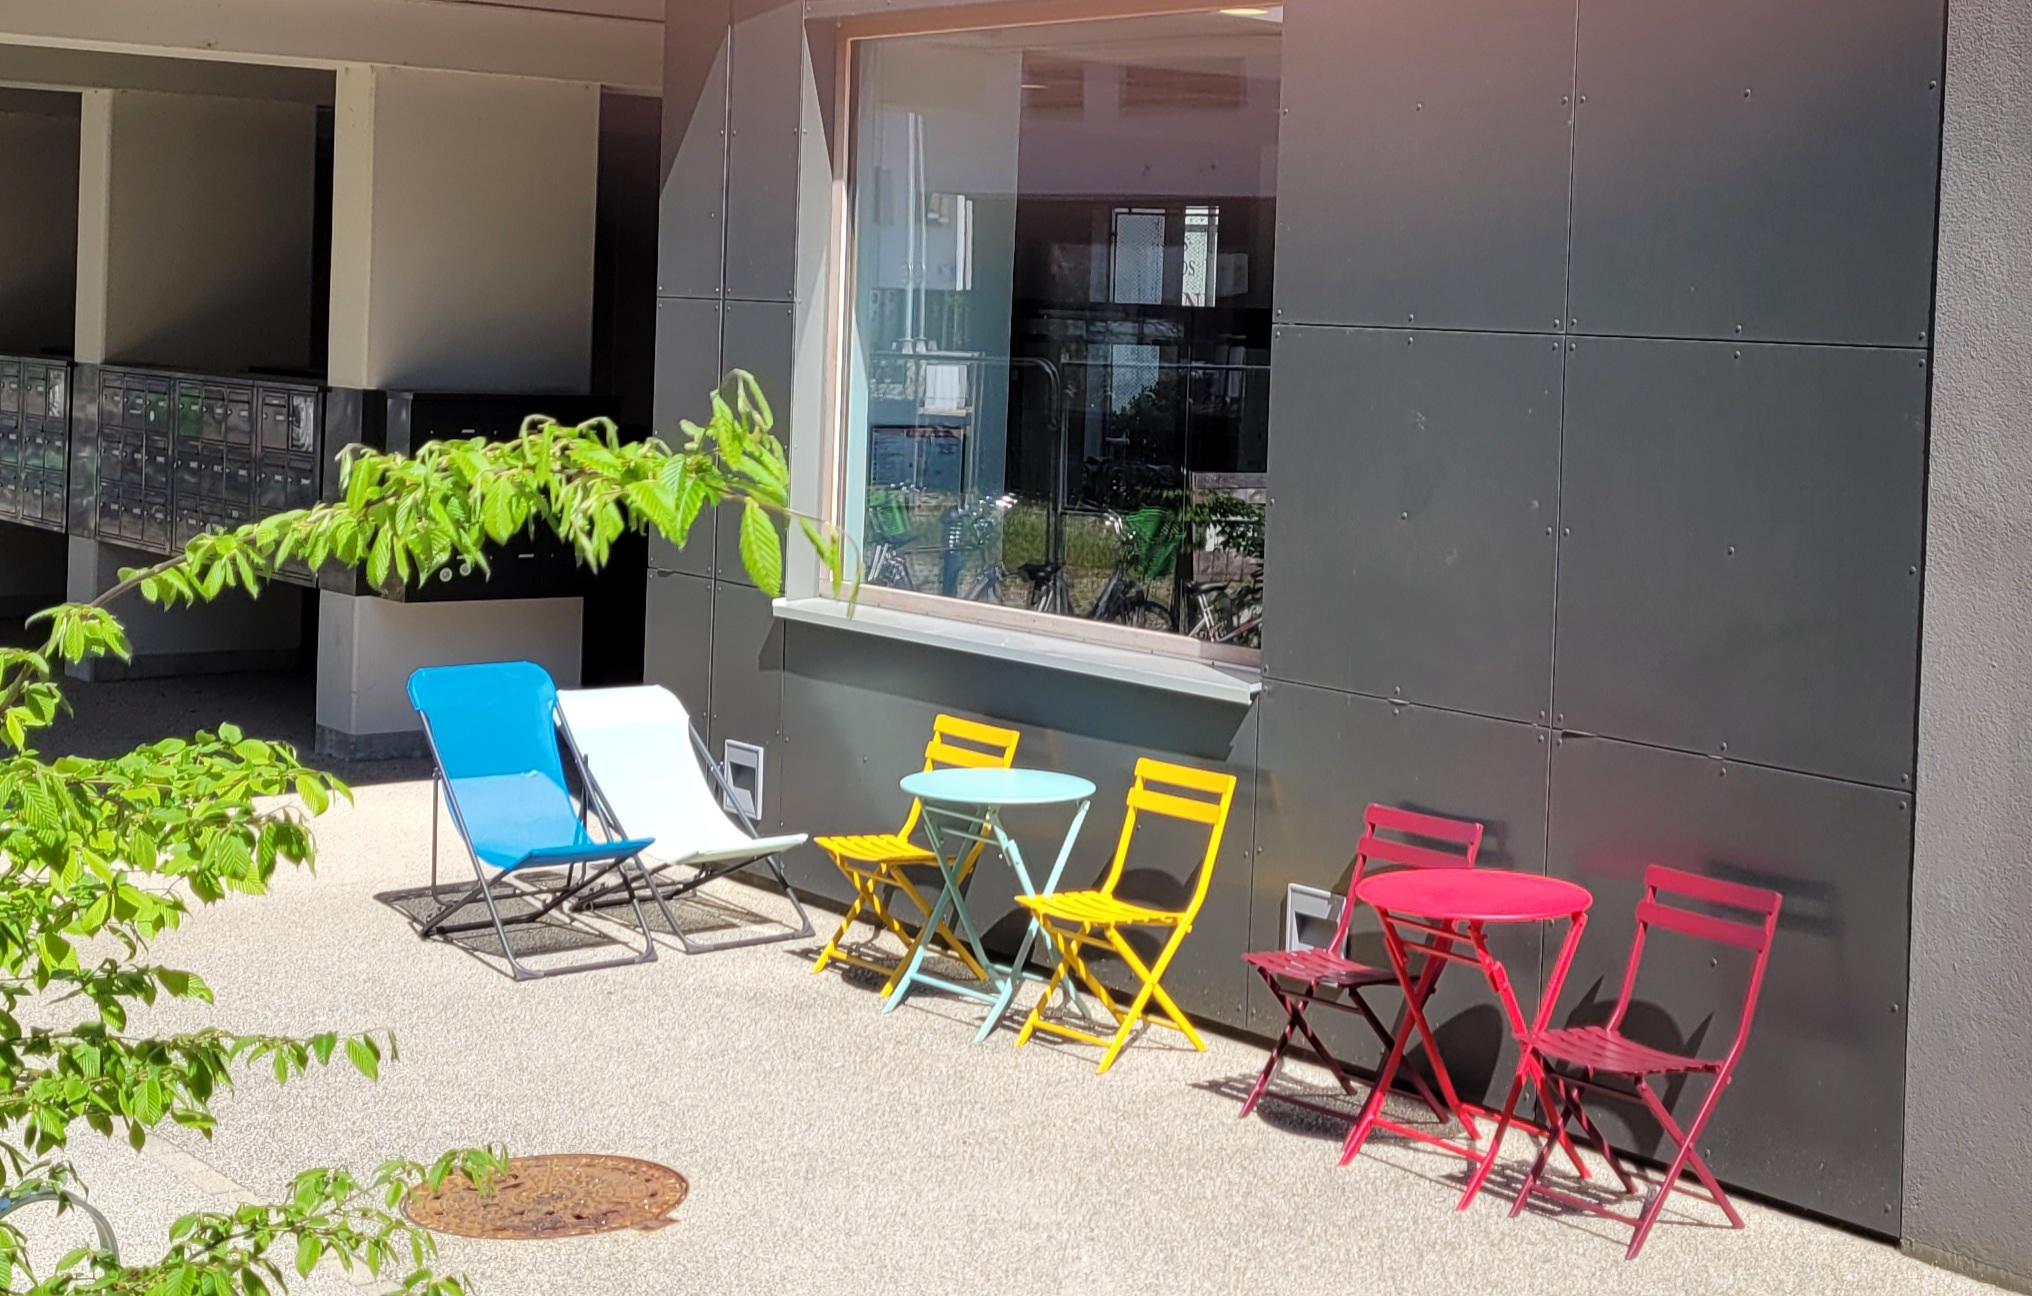 résidence etudiante strasbourg kellermann studio logement